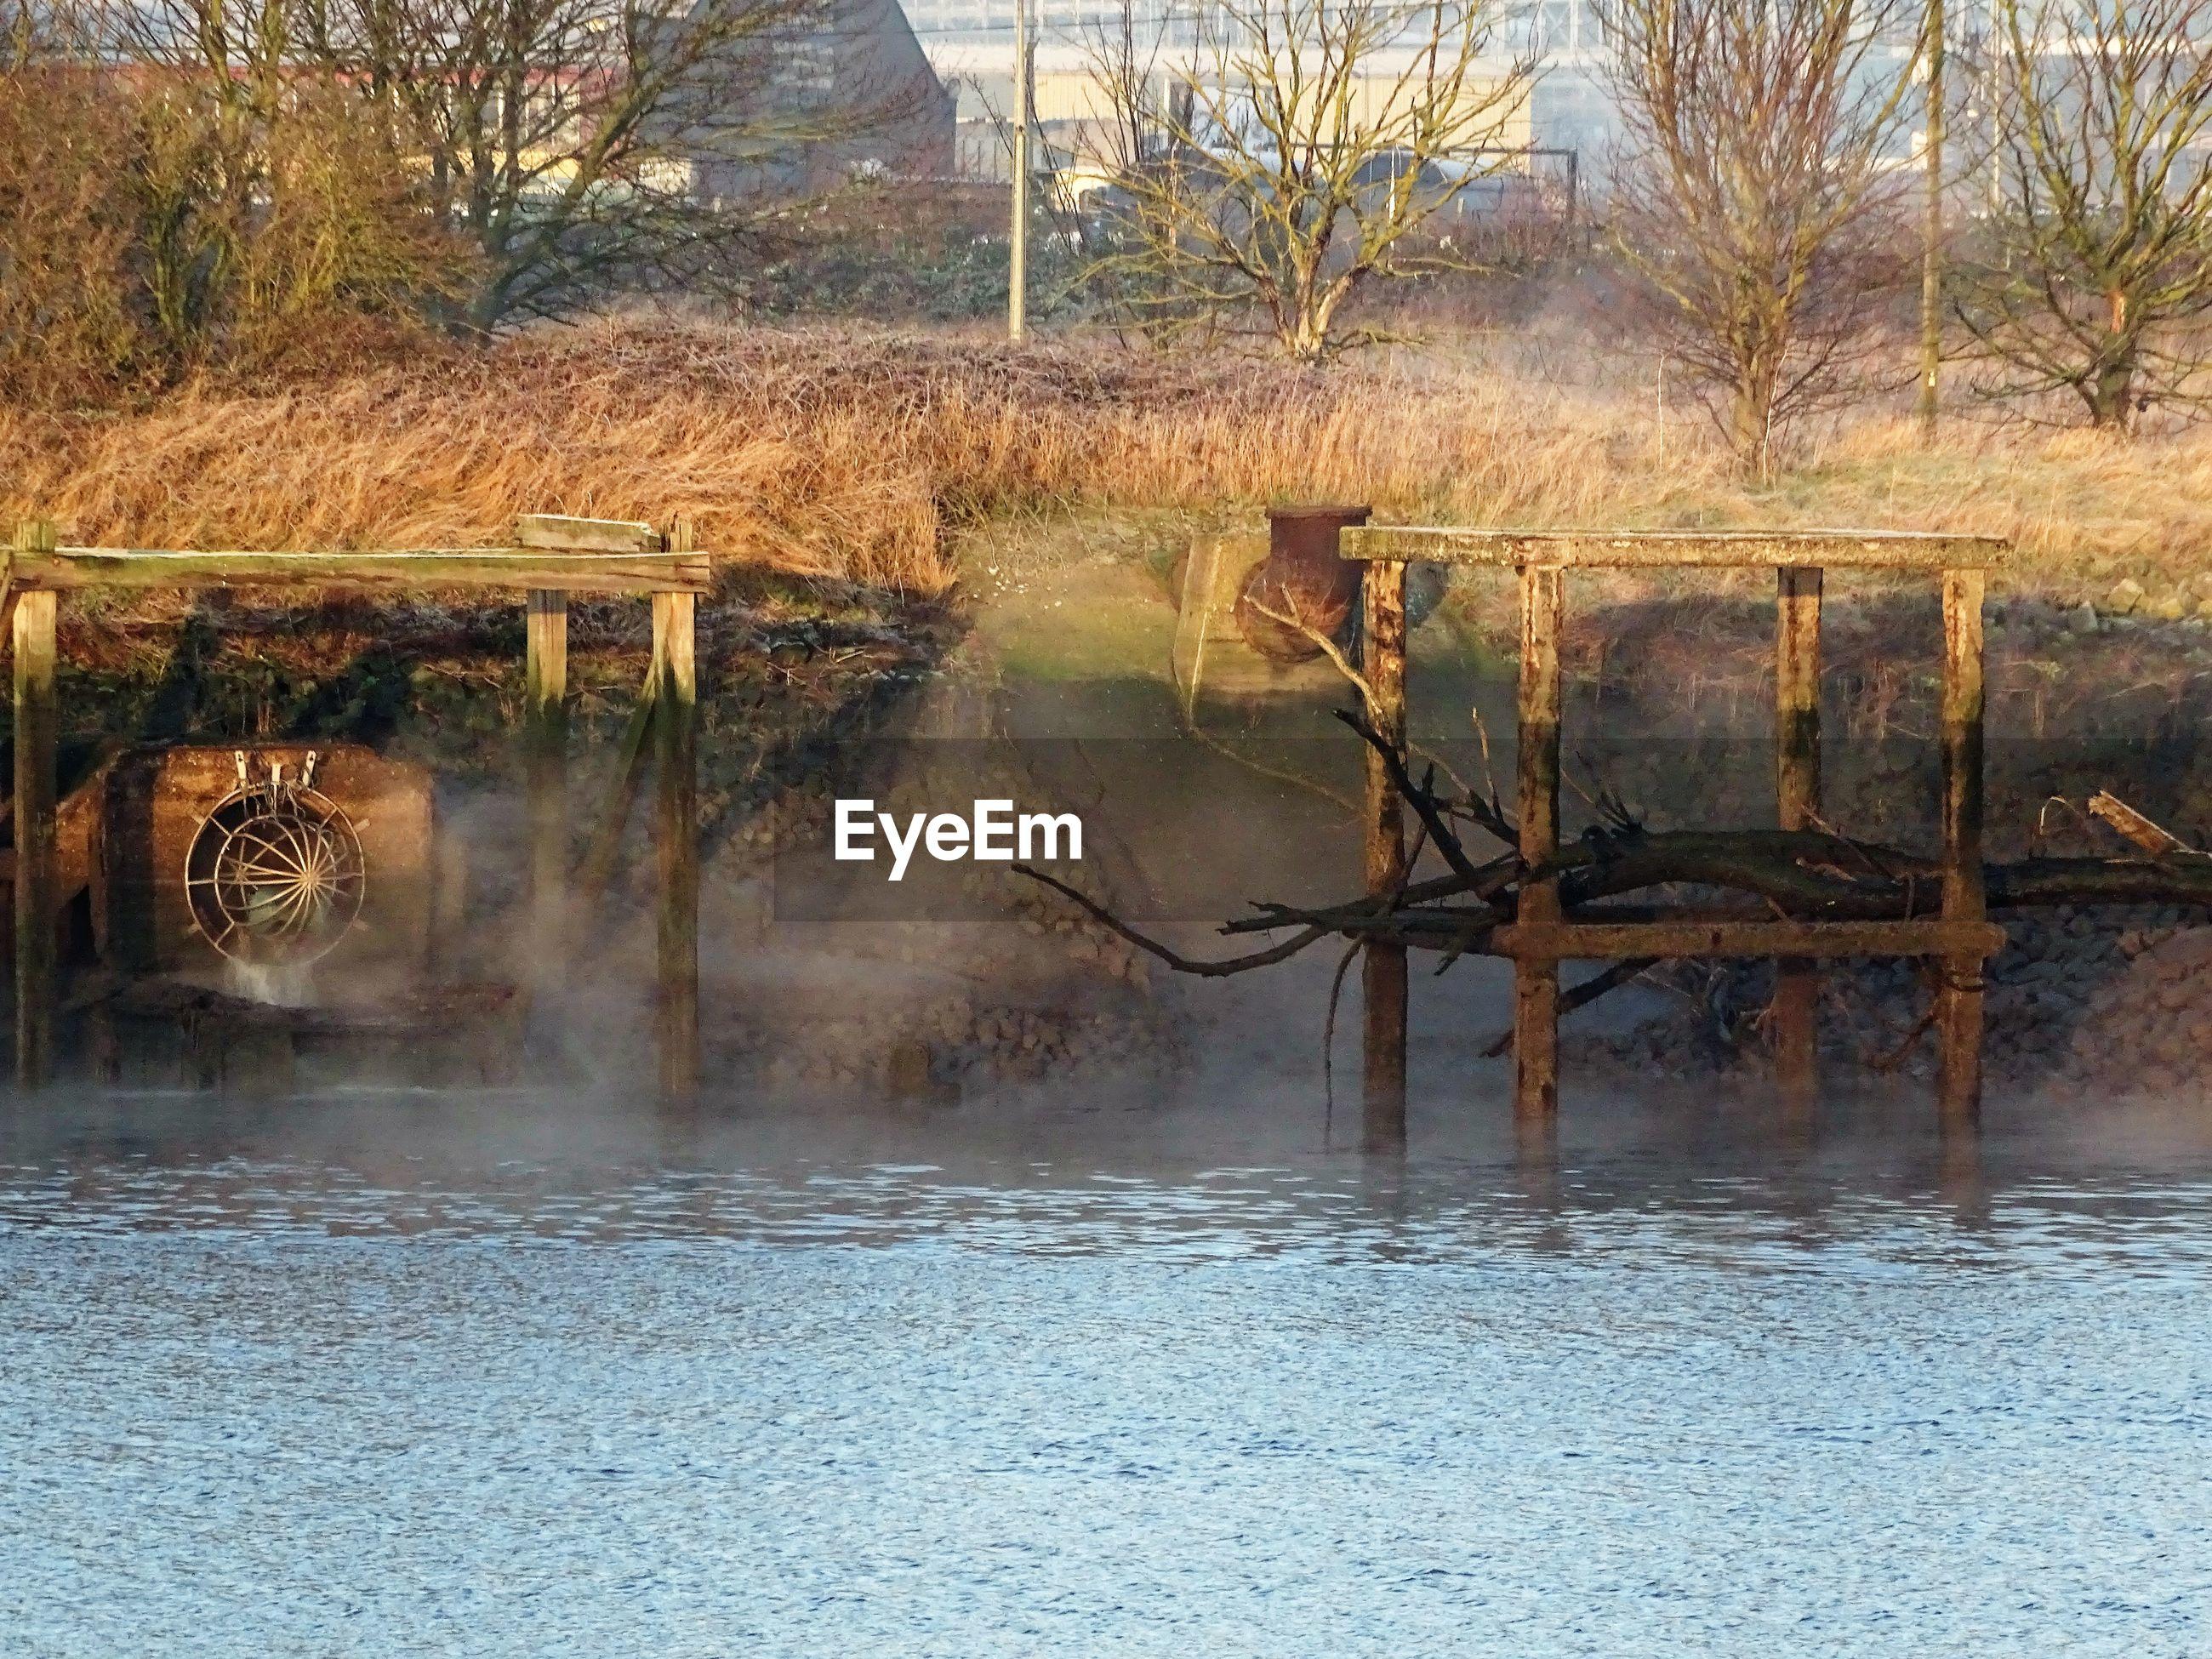 River by field